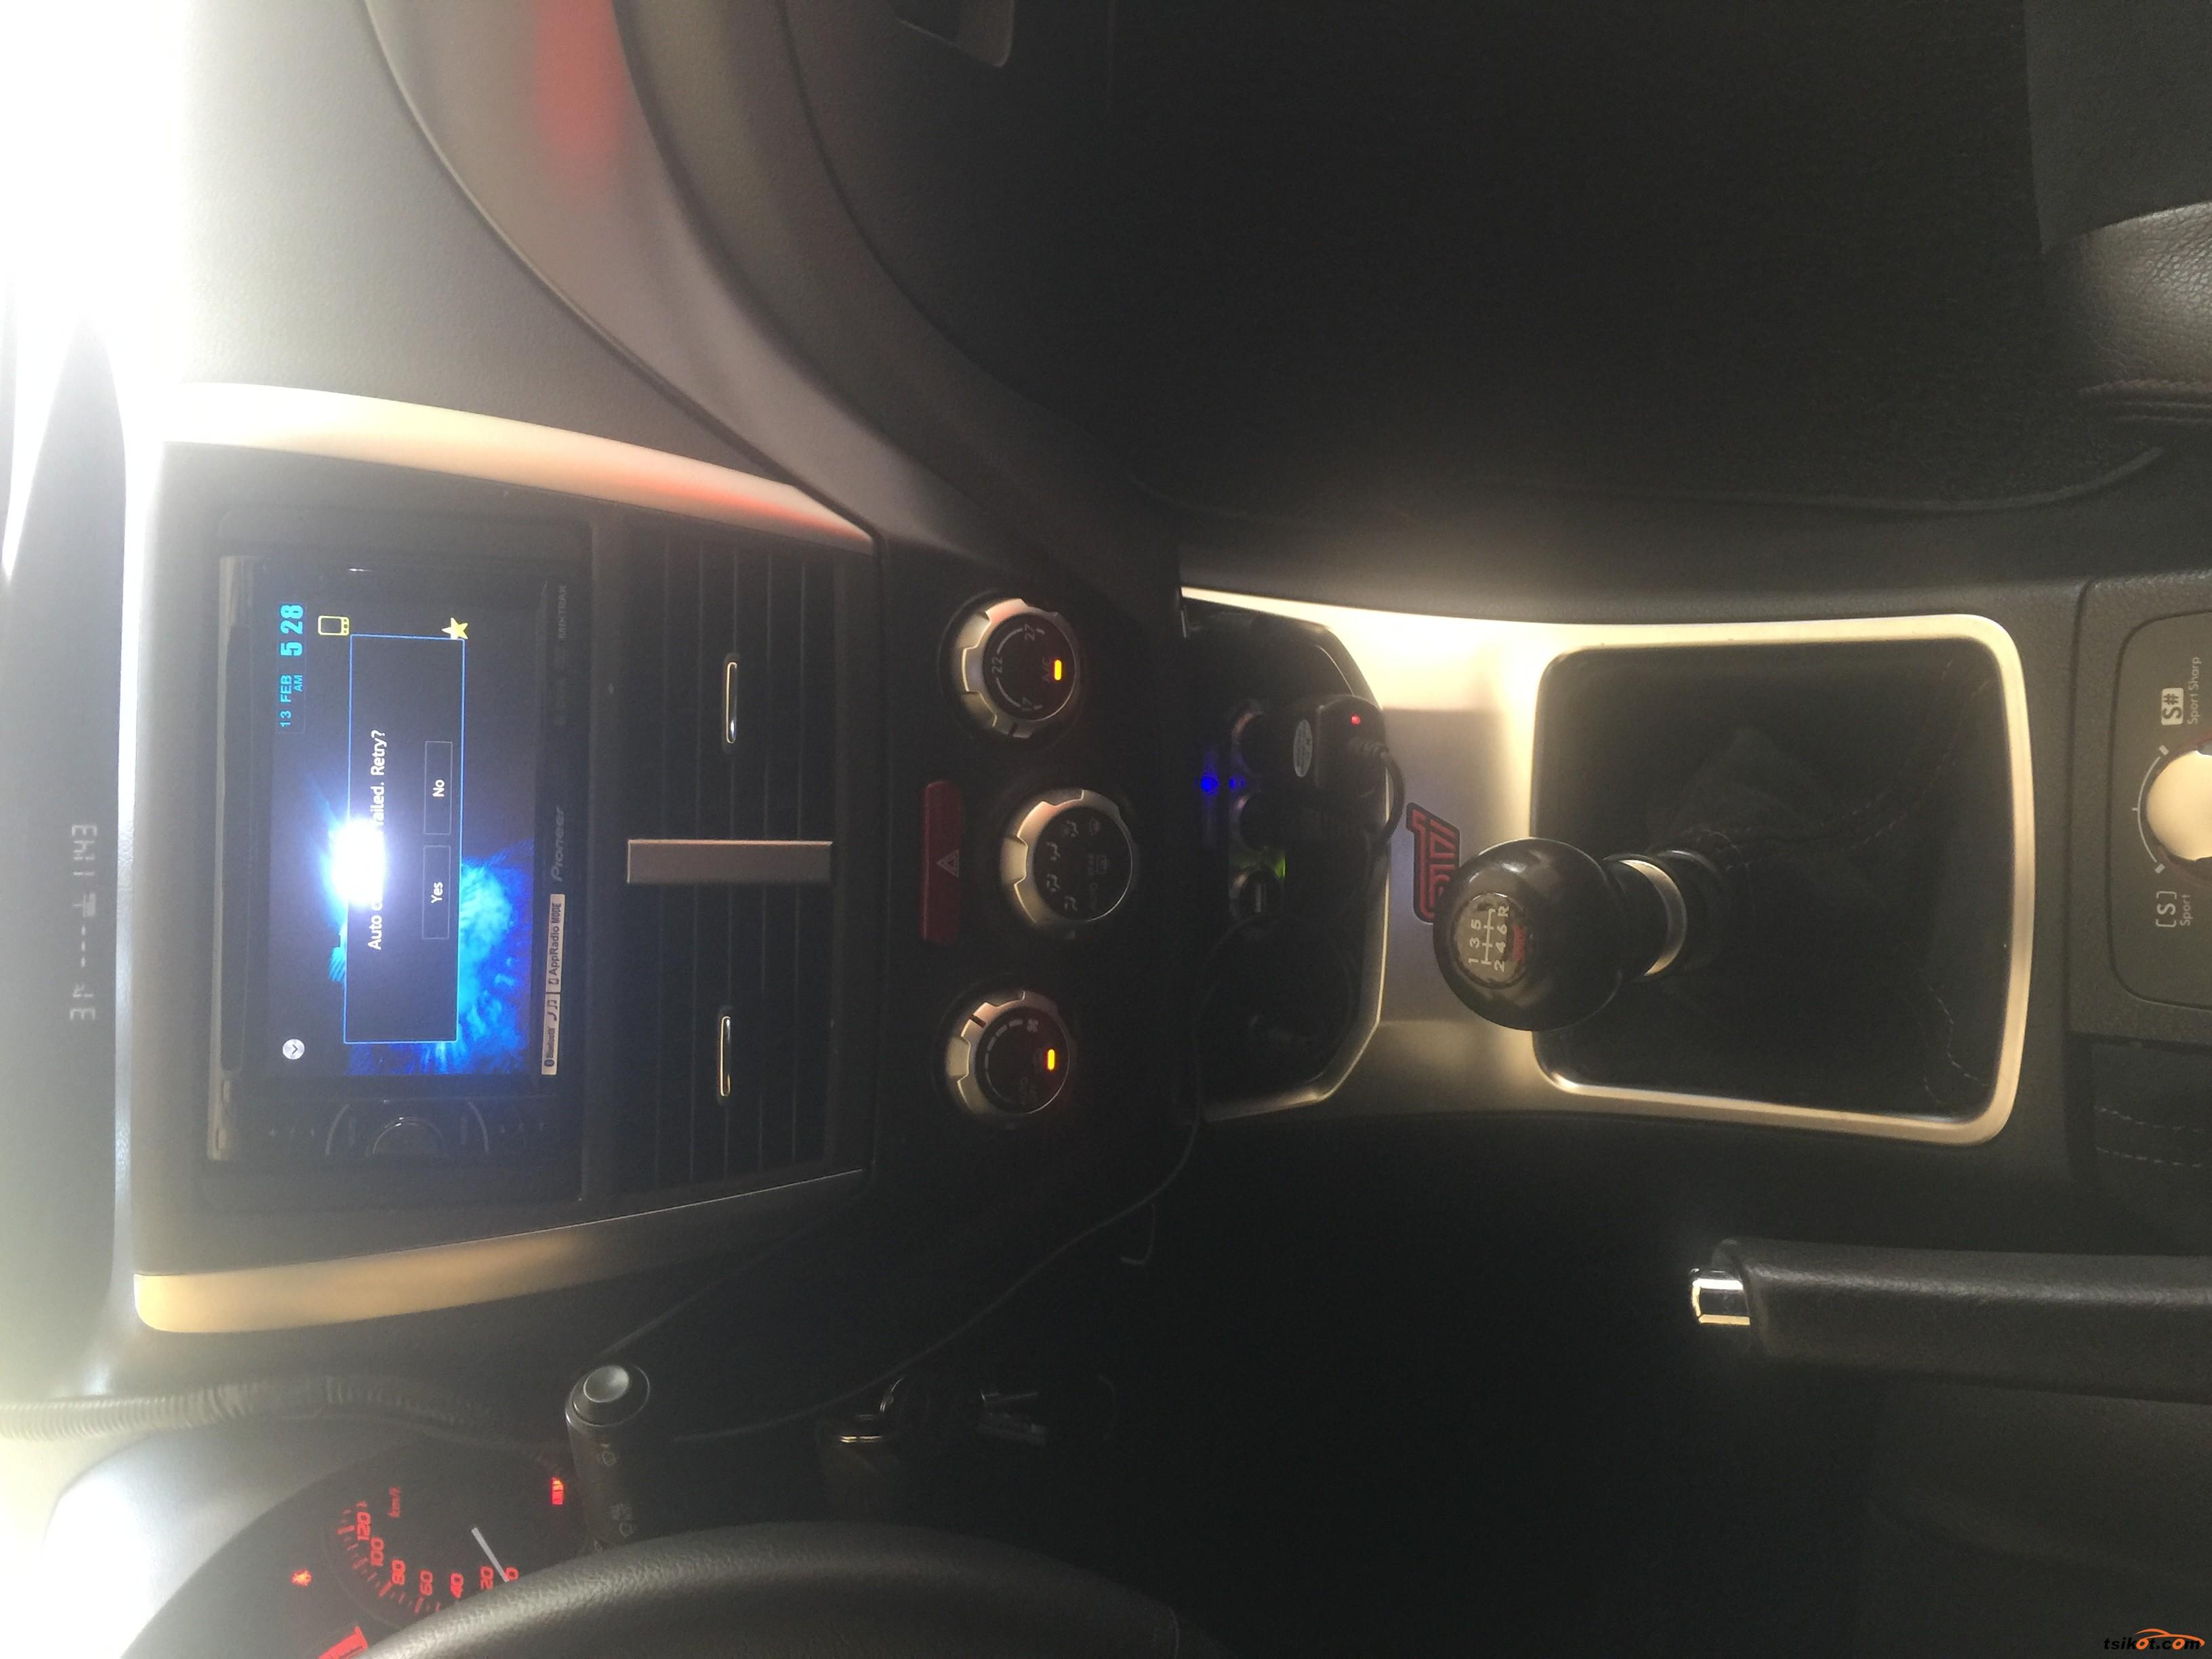 Subaru Impreza Wrx 2011 - 9